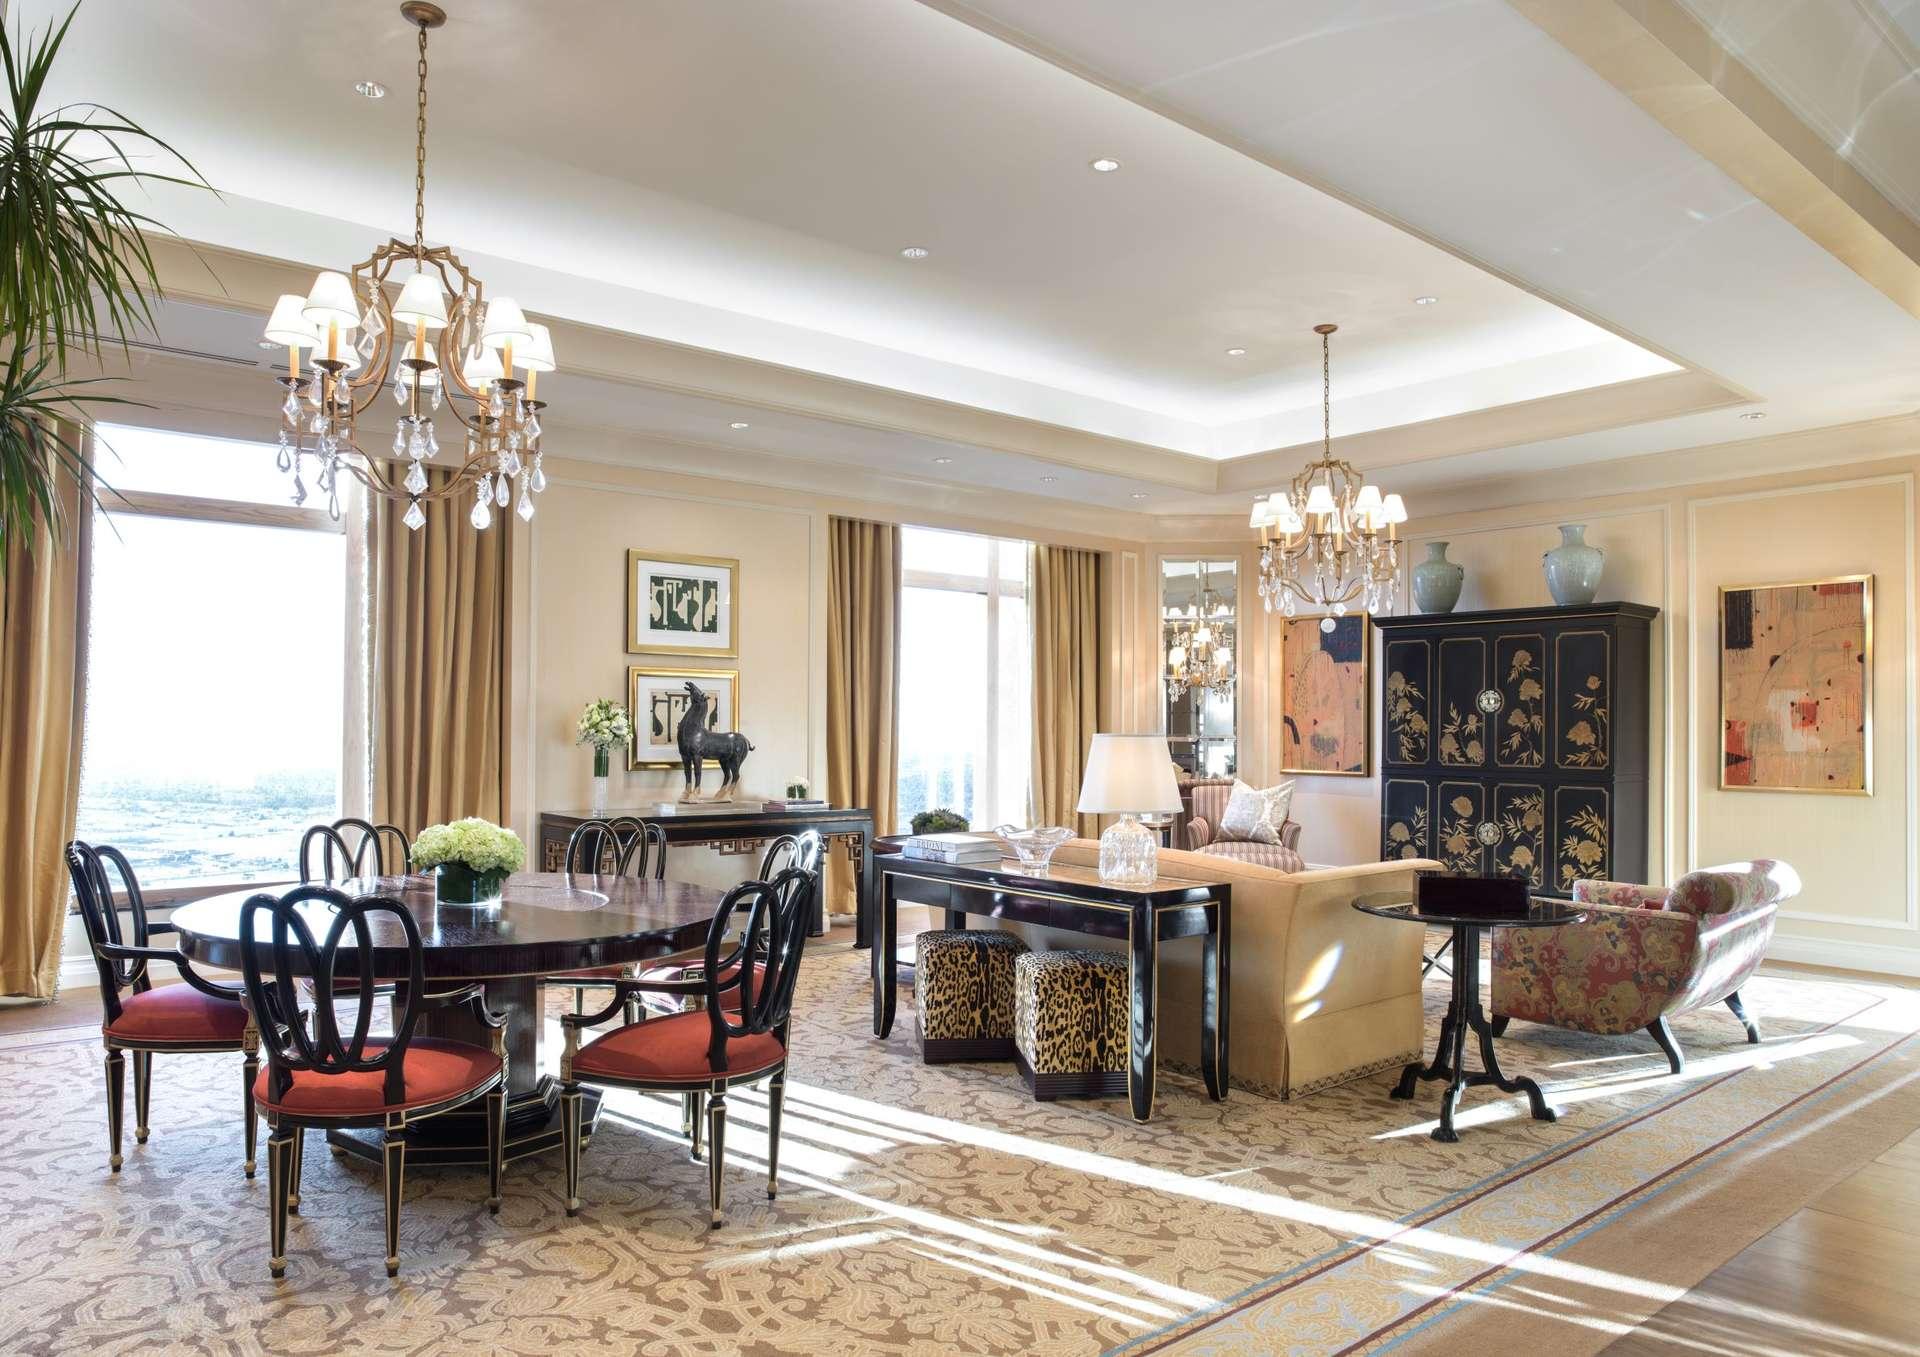 Luxury vacation rentals usa - Nevada - Las vegas - The palazzo - Palazzo Penthouse - Image 1/15